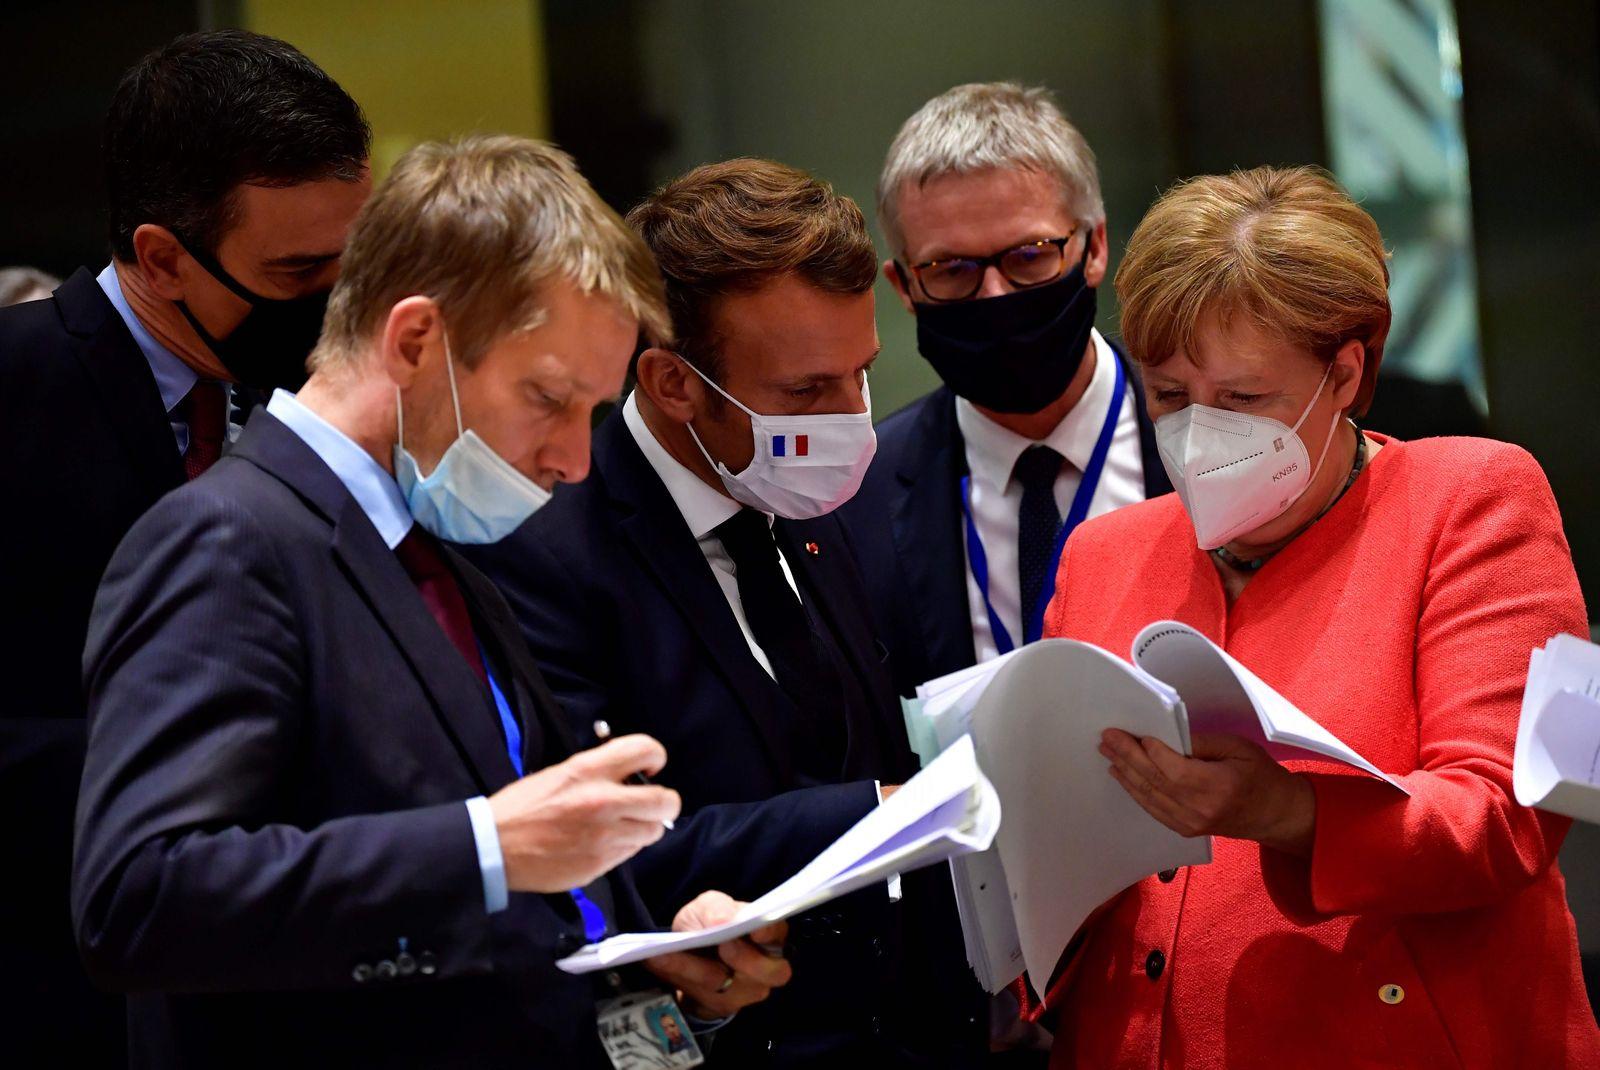 TOPSHOT-BELGIUM-EU-SUMMIT-HEALTH-VIRUS